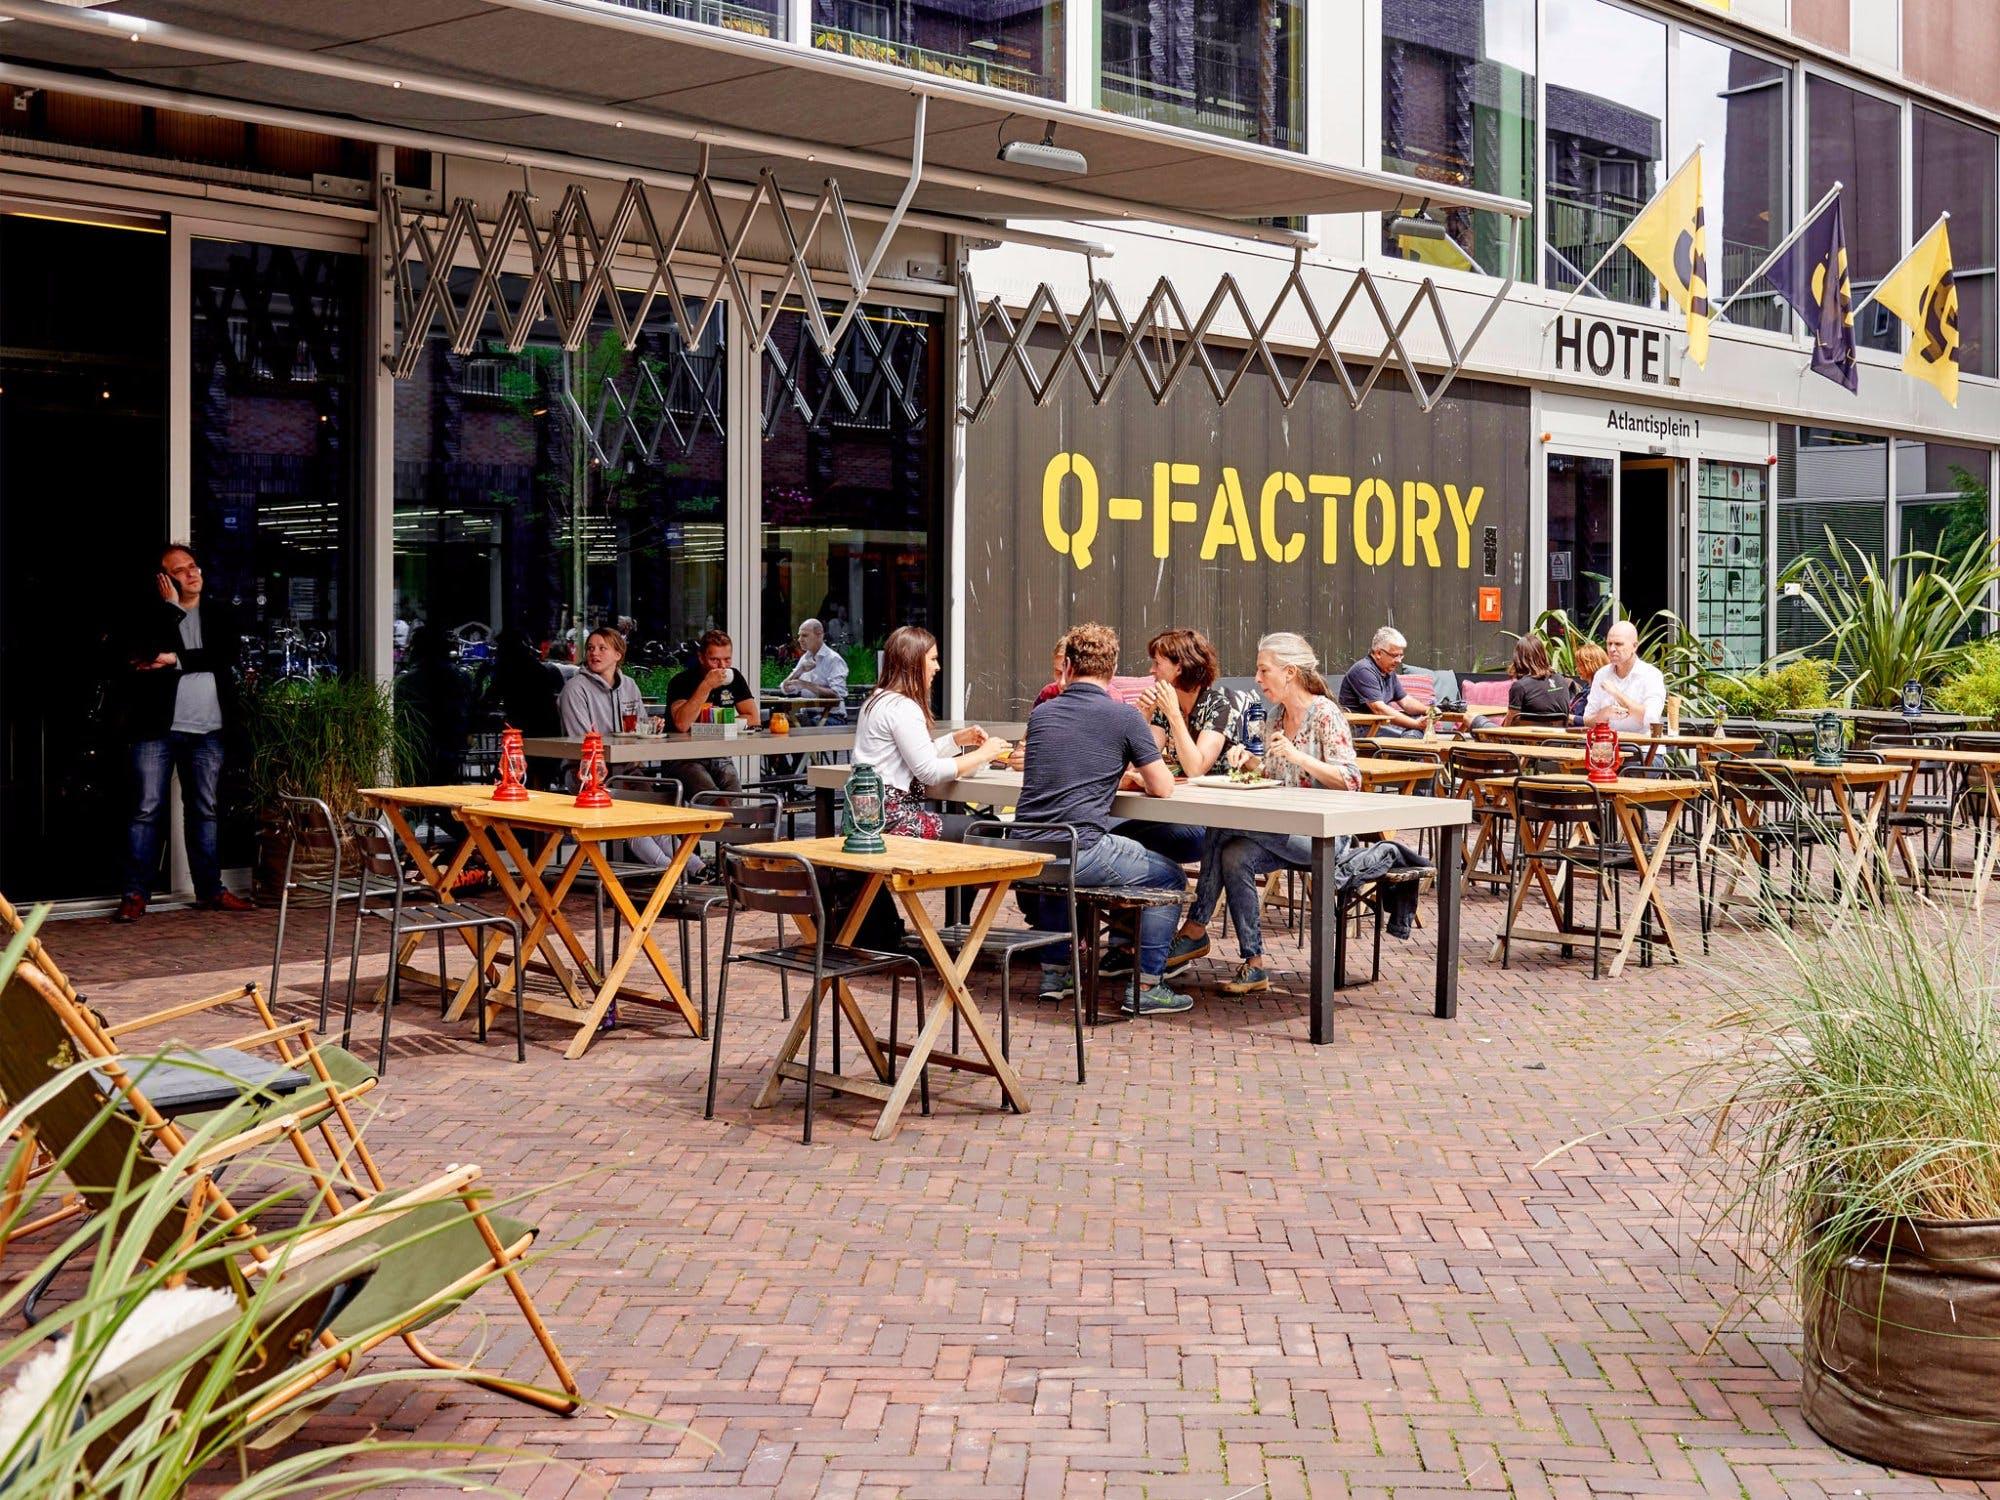 Q Factory Exterior